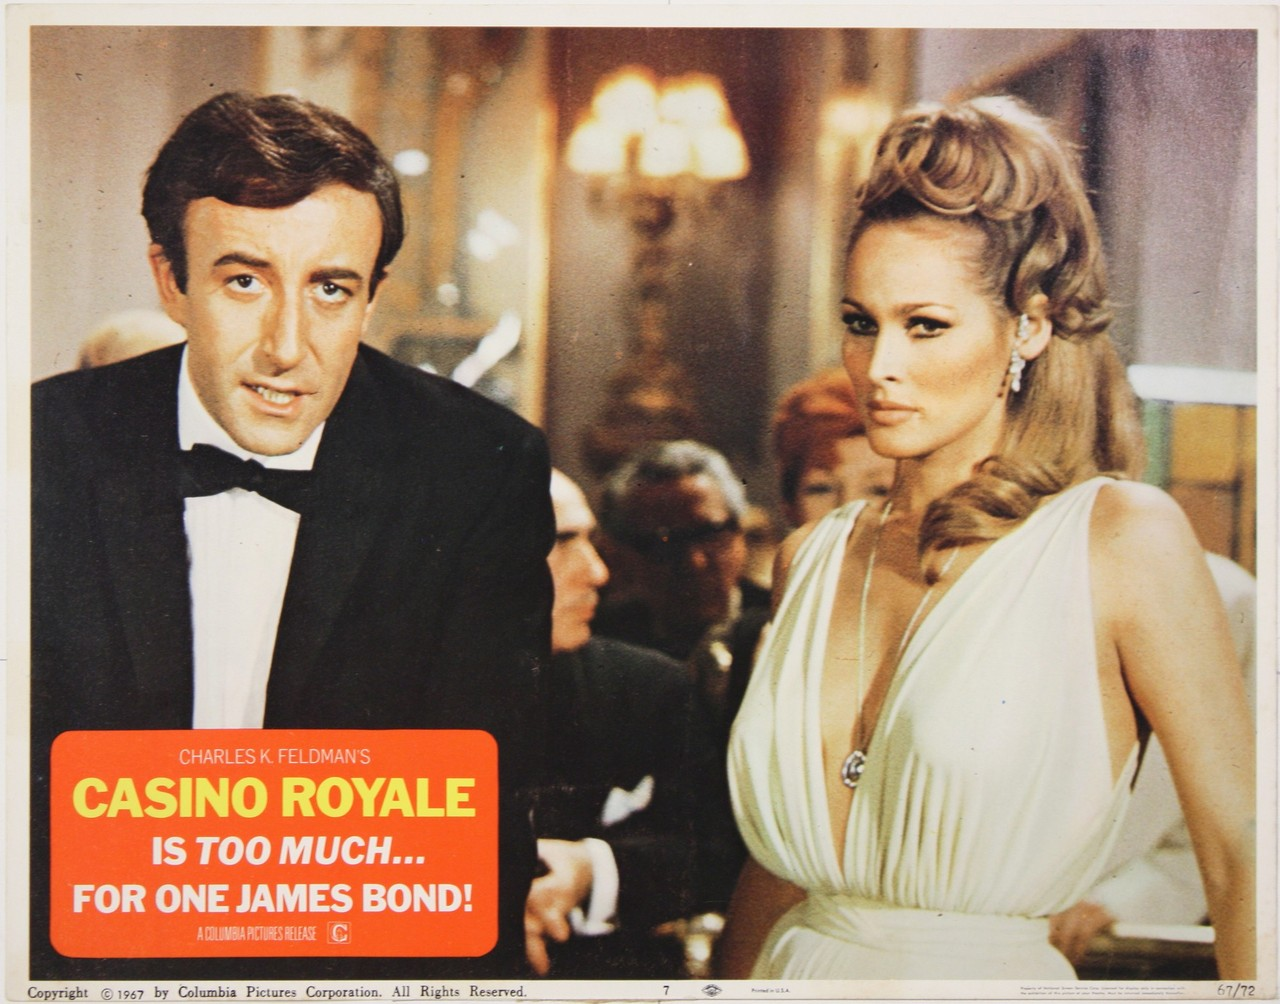 James bond casino royale pelicula completa en espaol latino